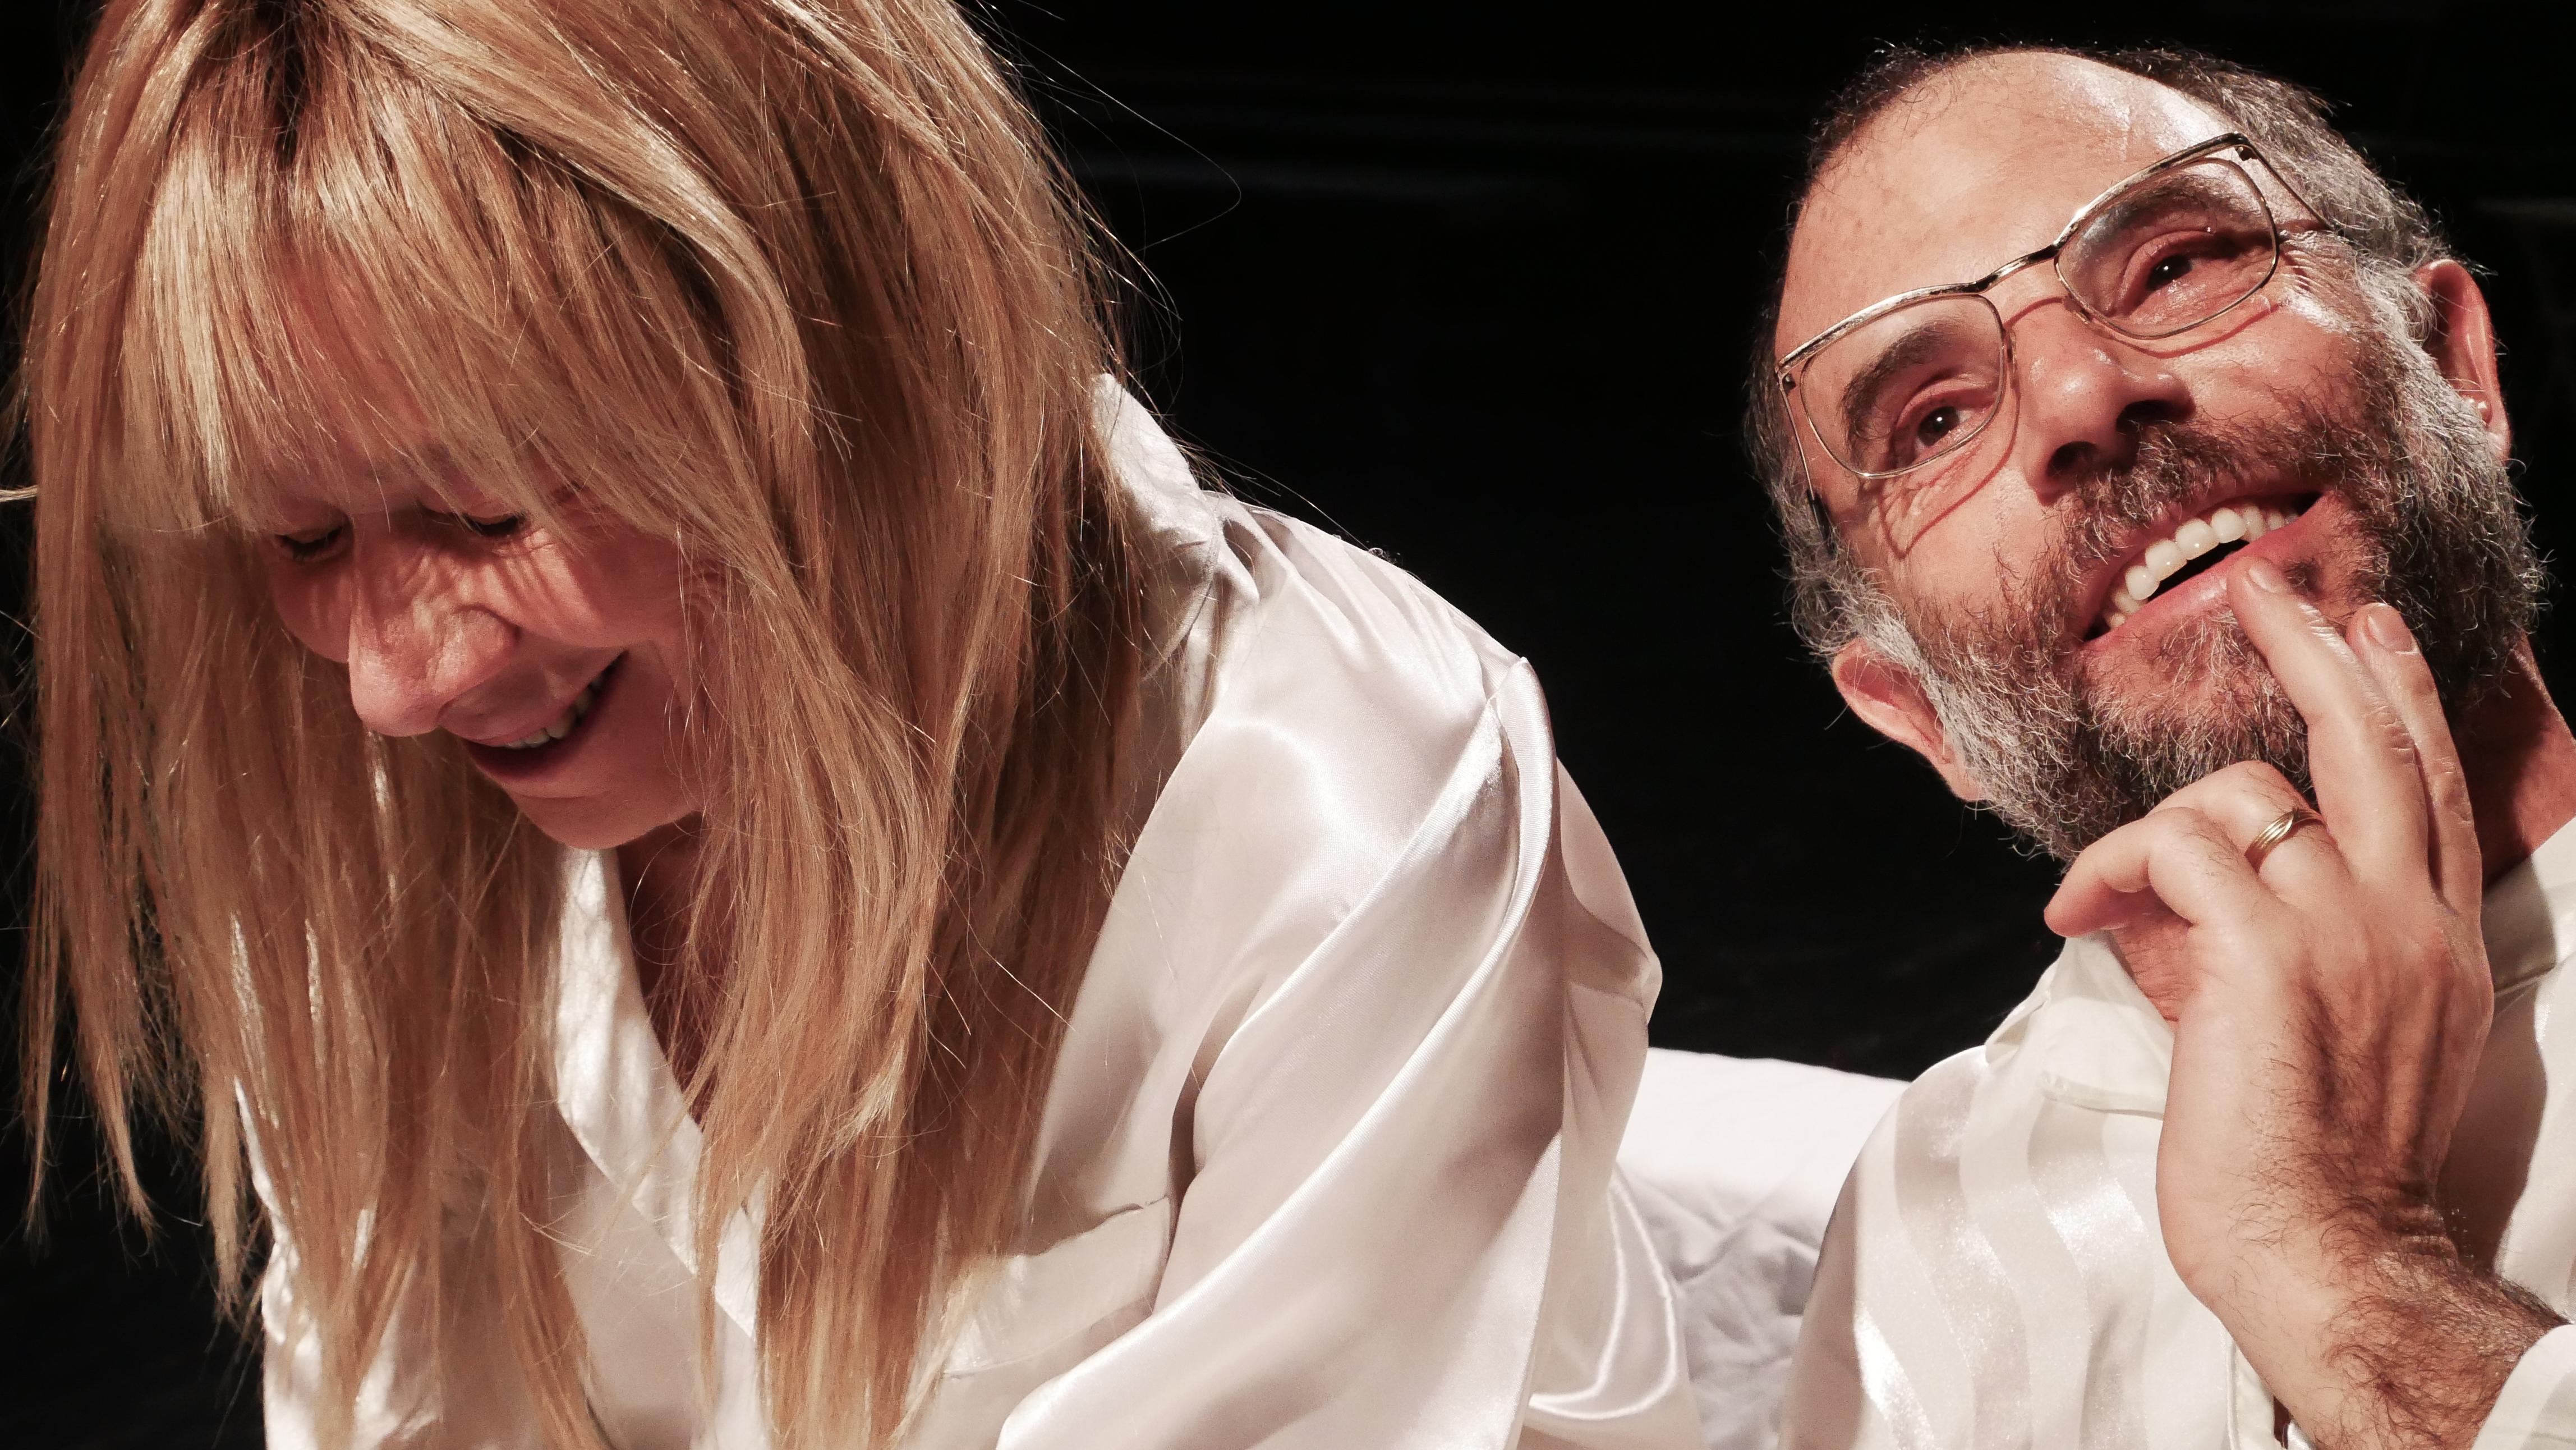 3 Sleepless di C. Churchill regia Lorenzo Loris nella foto Elena Callegari, Mario Sala, Ph Davide Pinardi